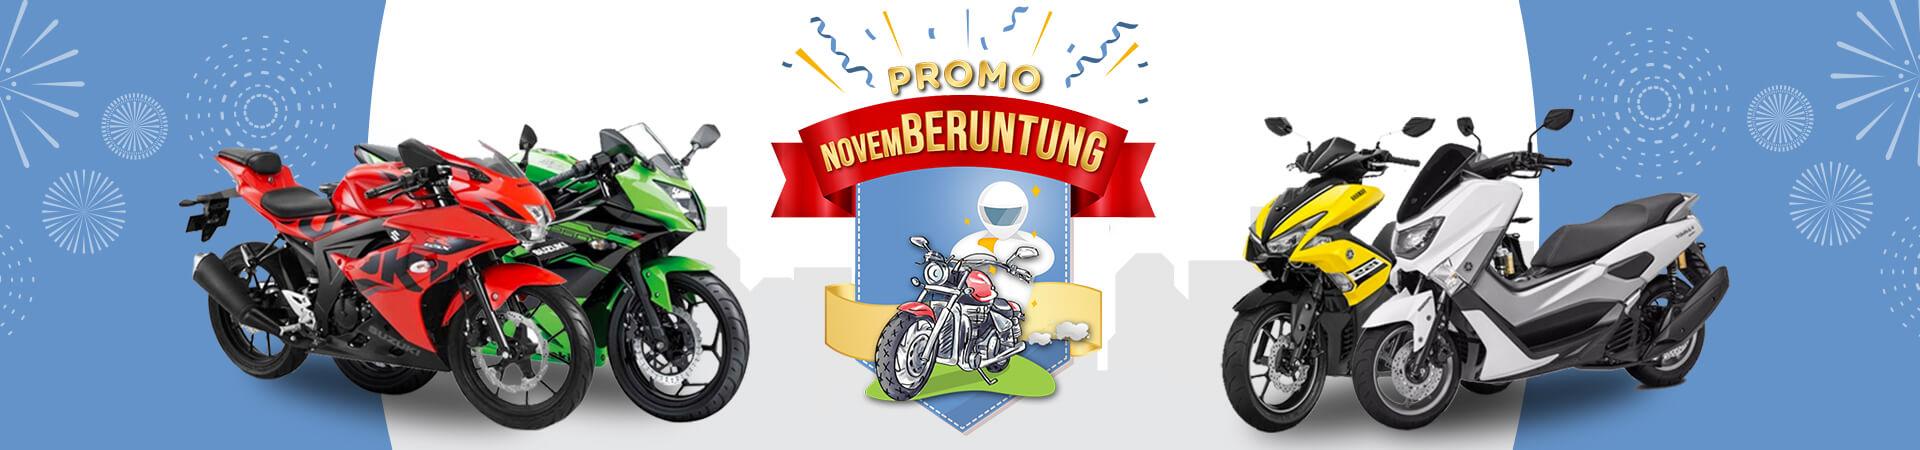 https://moladin.com/promo/novemberuntung?utm_source=homepage_web_banner&utm_medium=homepage_web_banner_novemberuntung&utm_campaign=novemberuntung